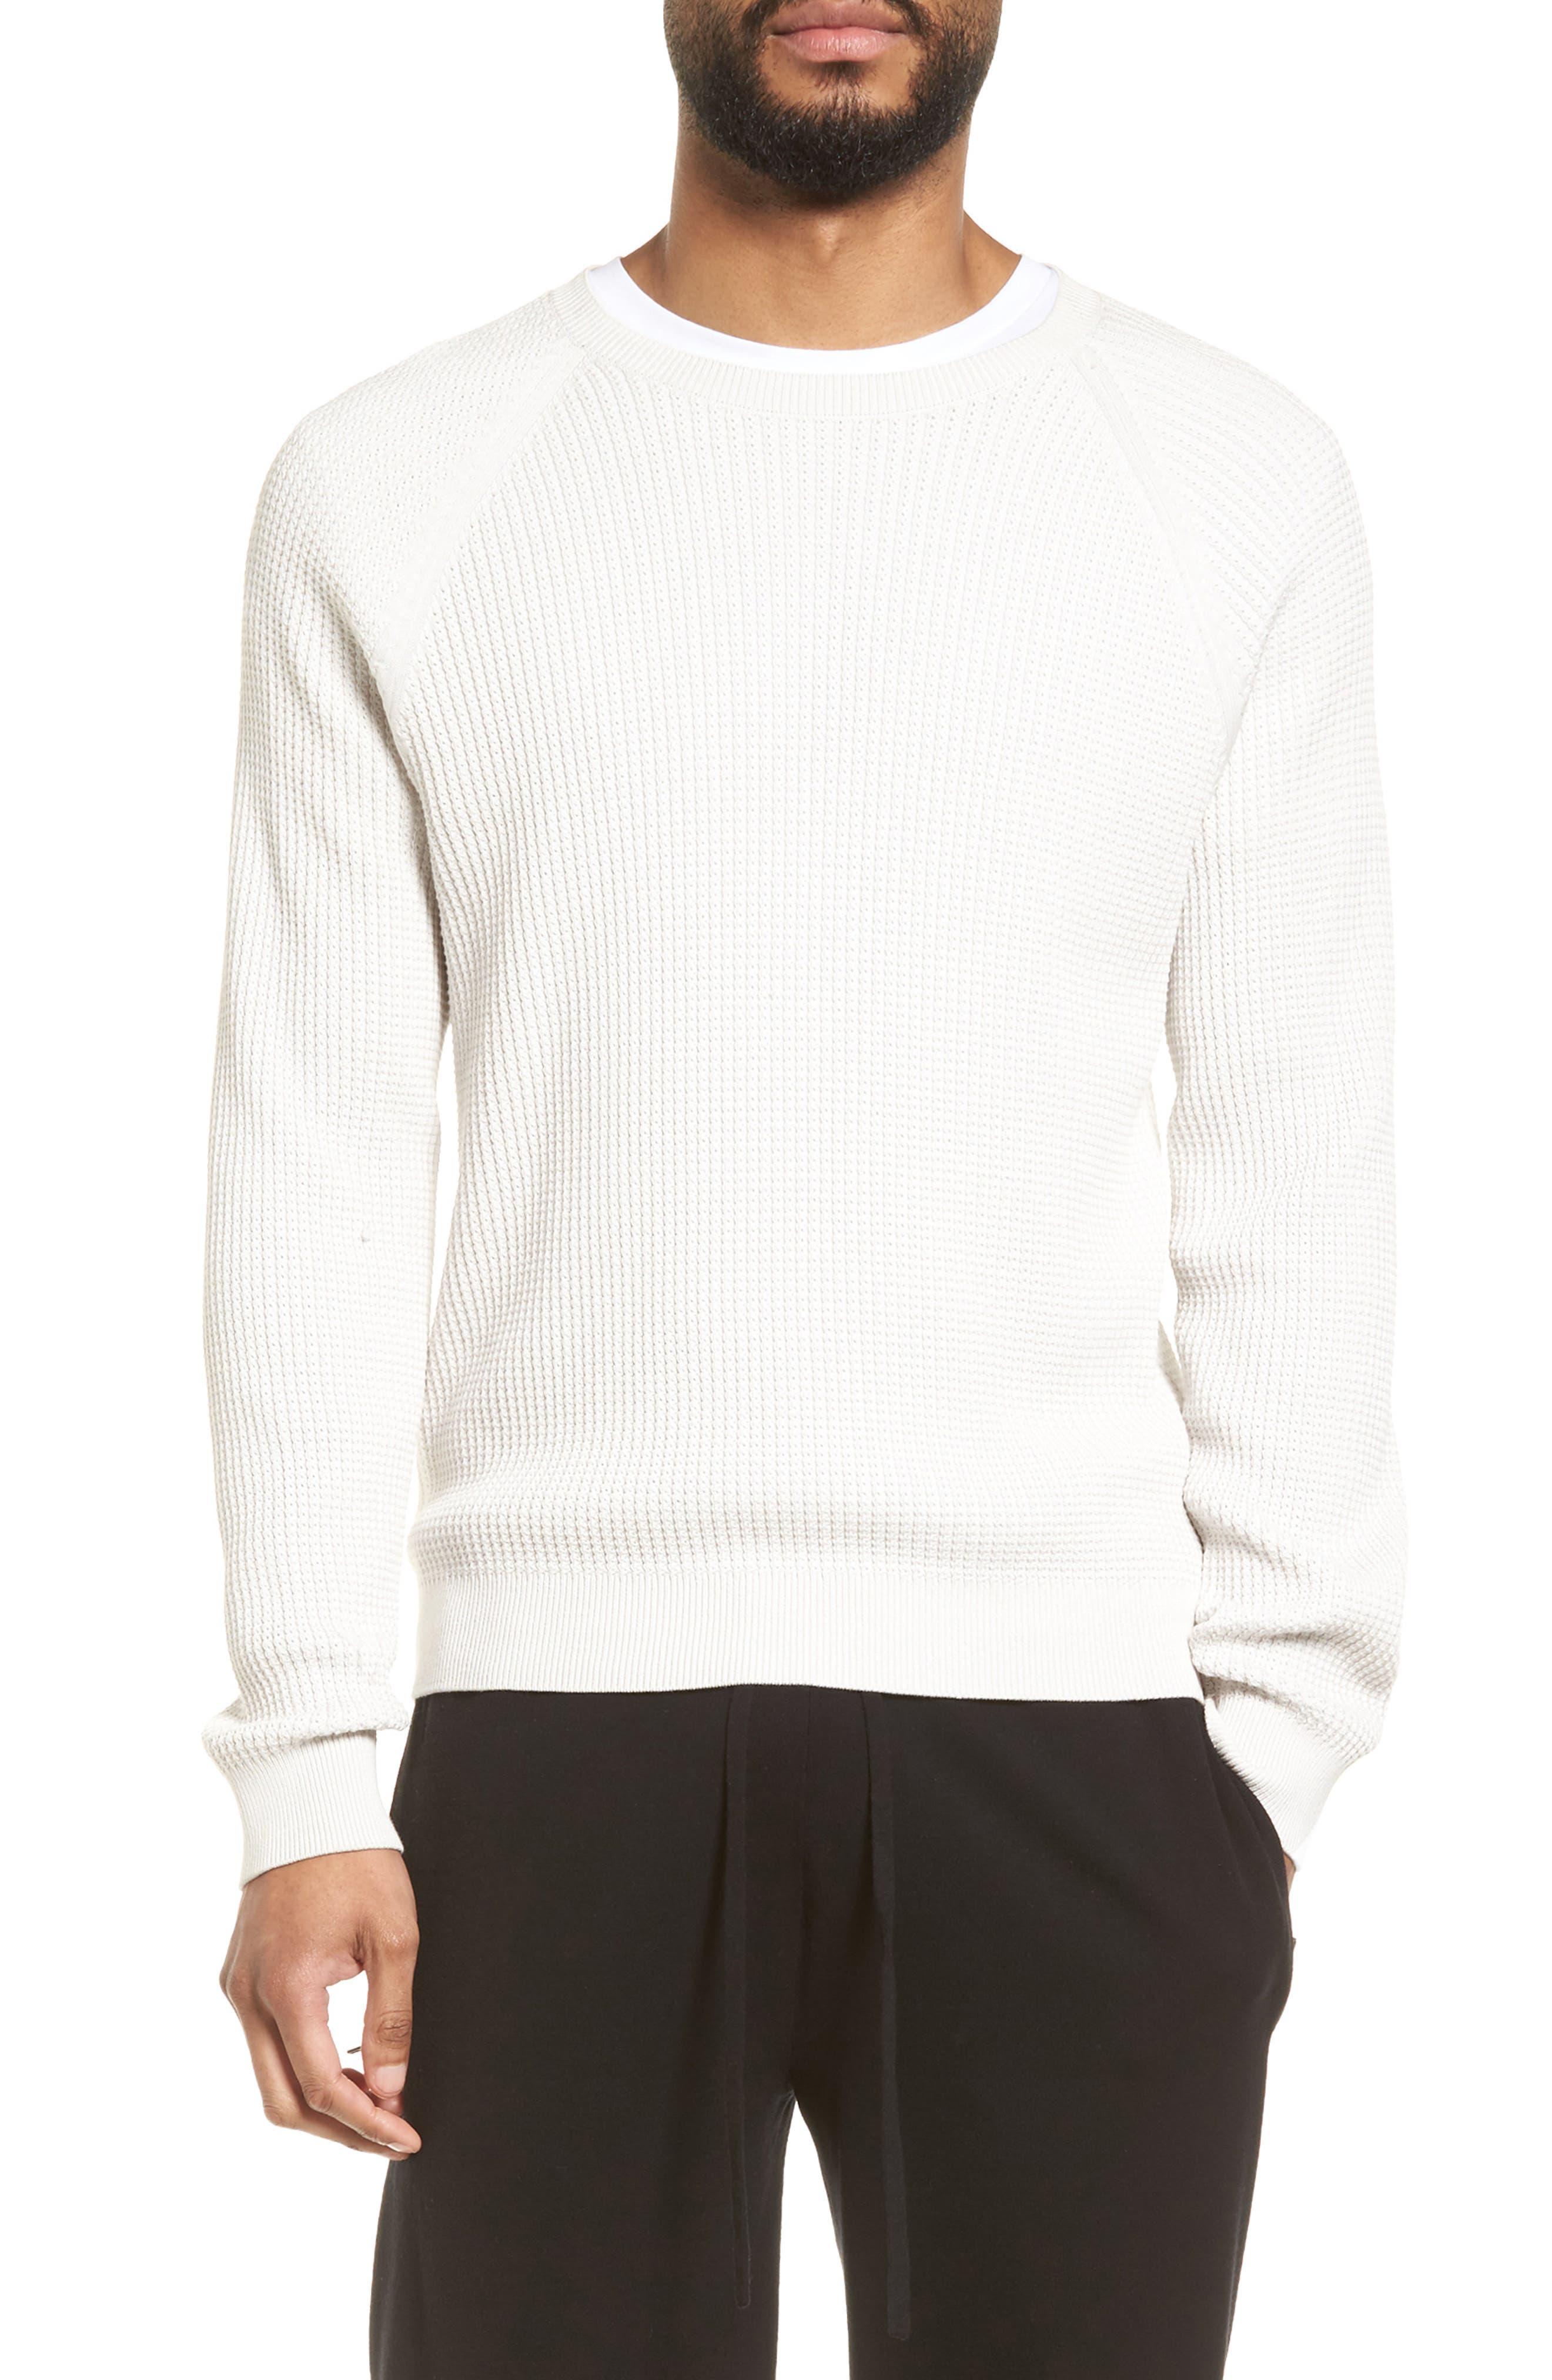 Slim Fit Thermal Knit Raglan Sweater,                             Main thumbnail 1, color,                             100